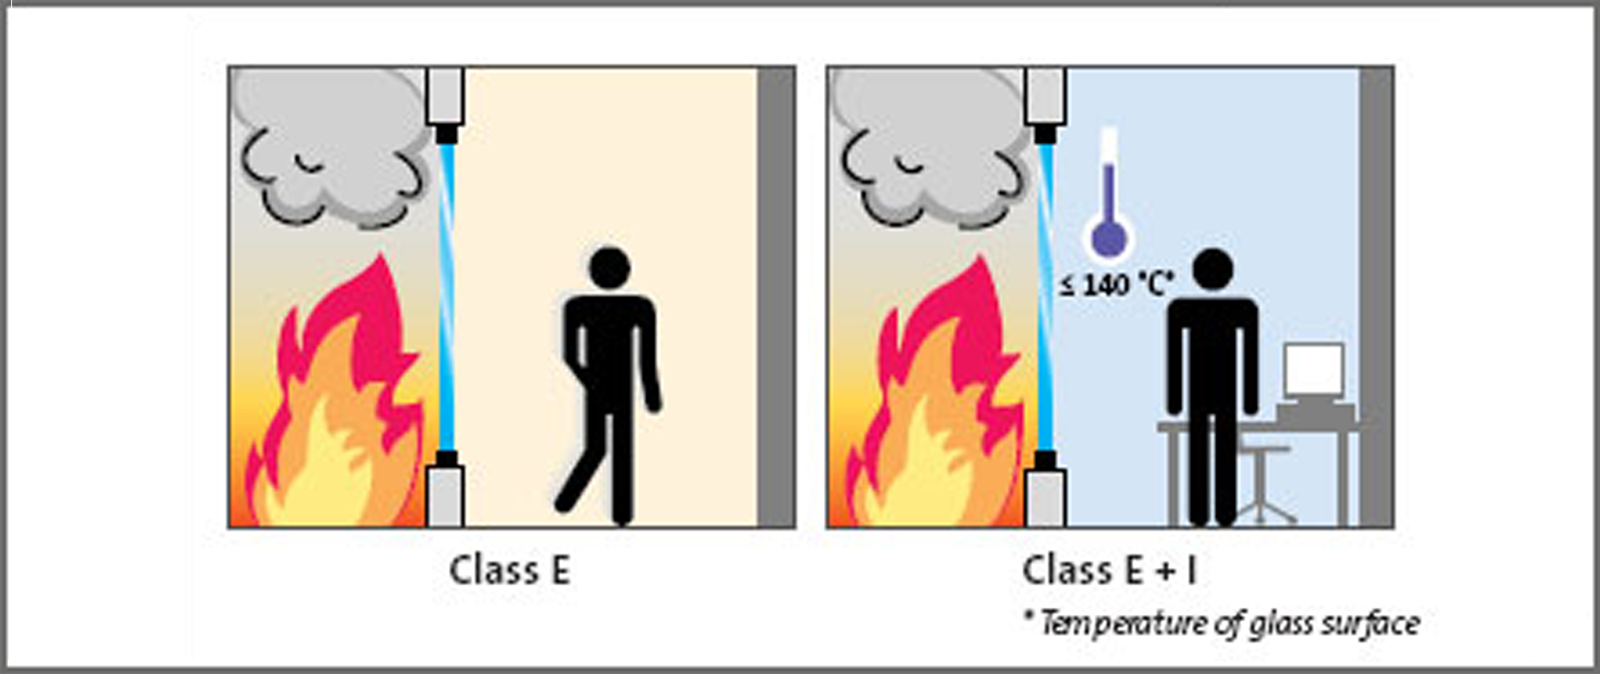 E Classifications of glazing